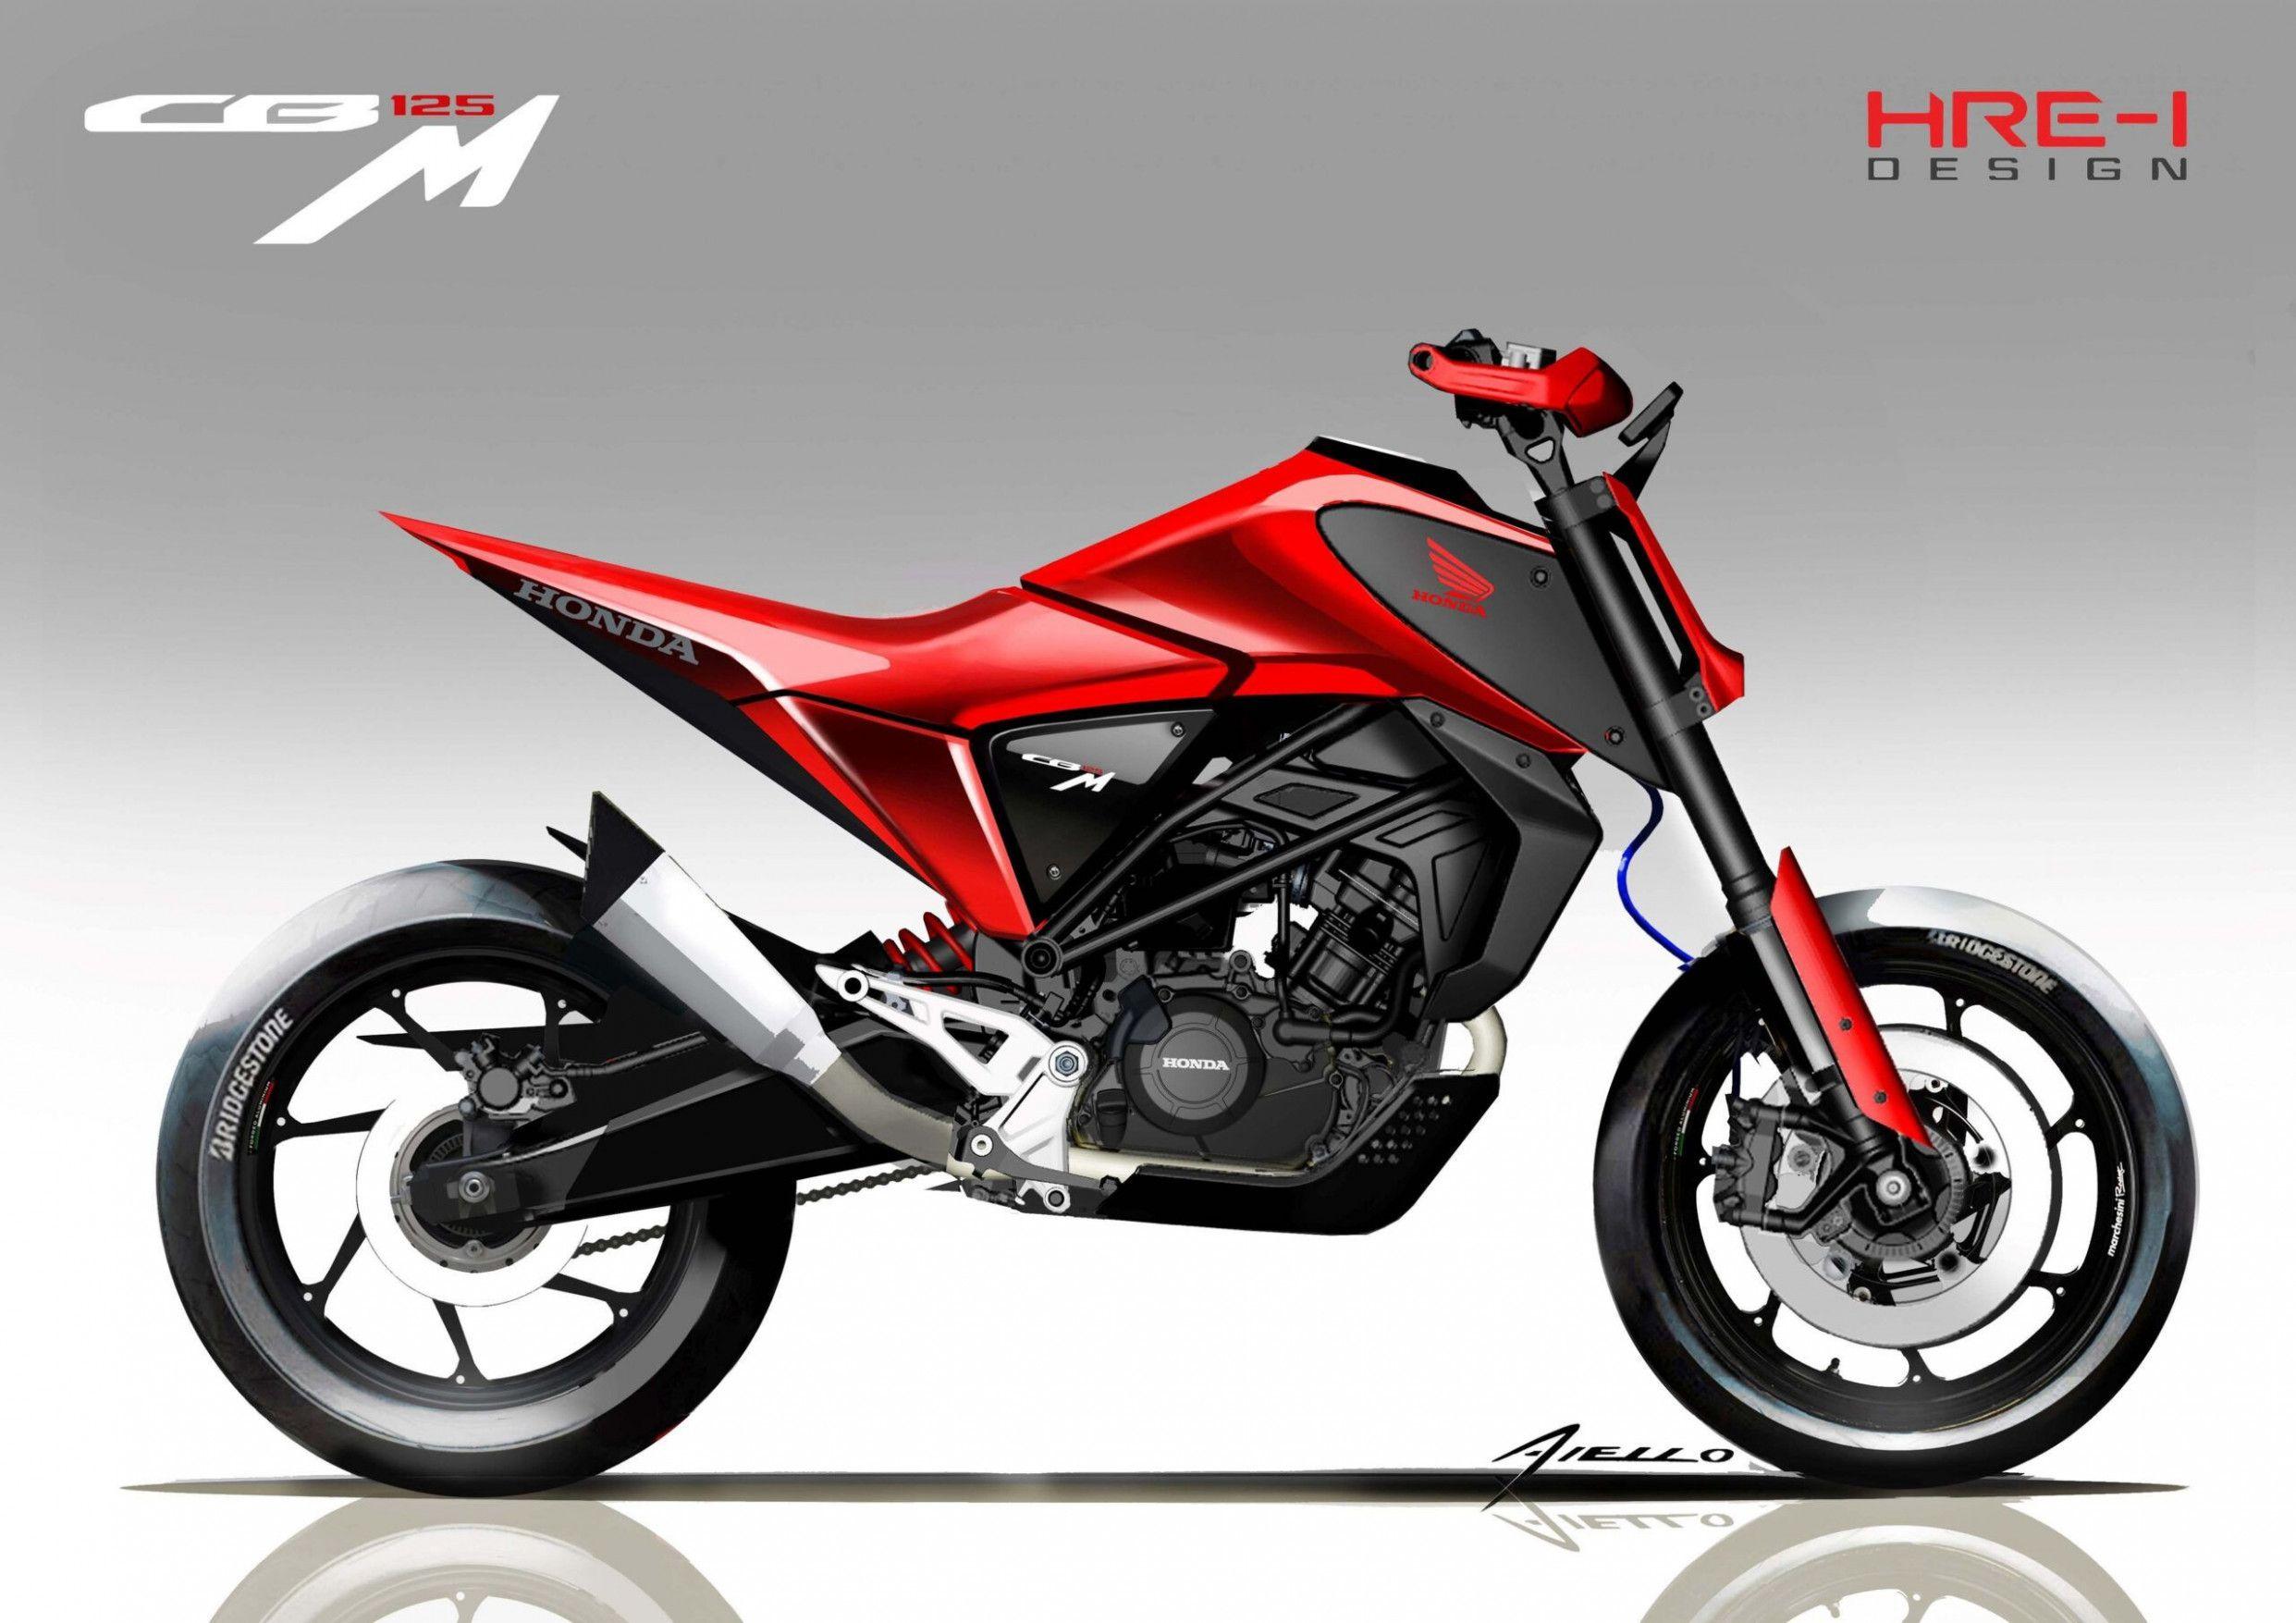 6 Picture Honda Tmx 125 Price 2020 In 2020 Honda Bikes Honda Motorcycles Supermoto